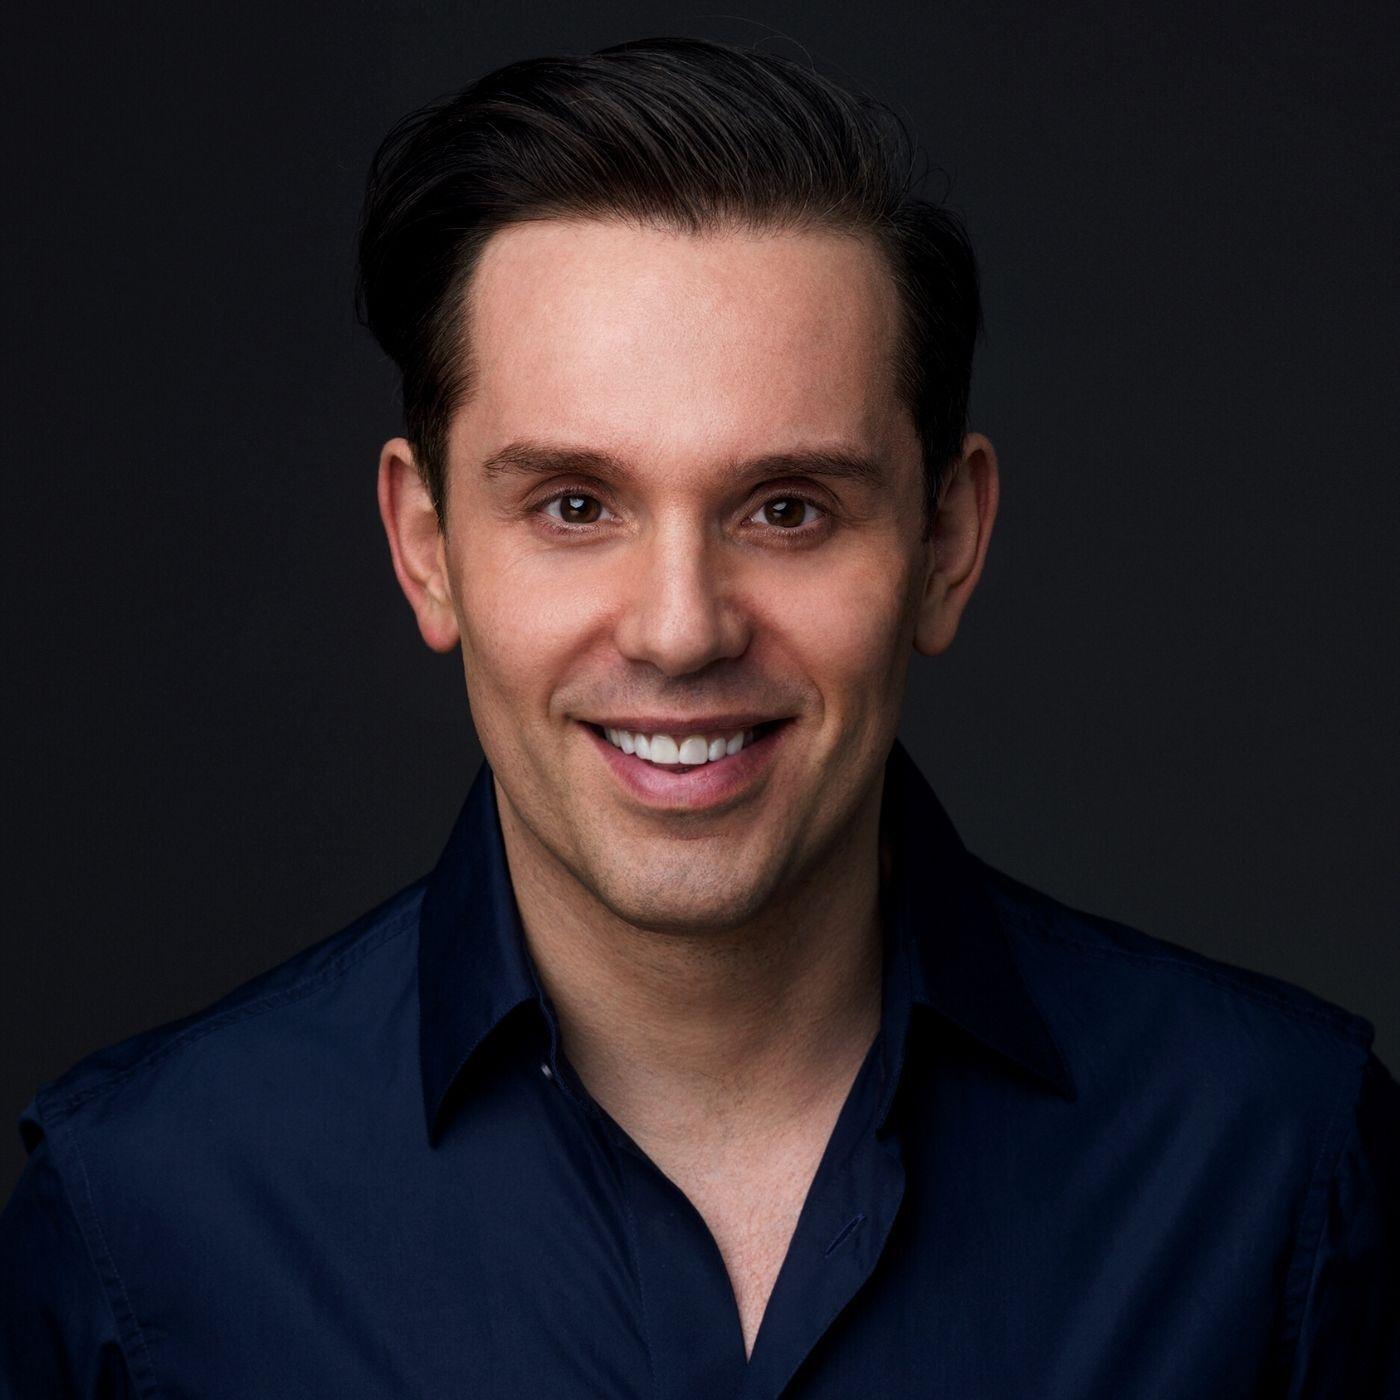 Folge 155: Christian Angermayer, was treibt Dich als Unternehmer an?